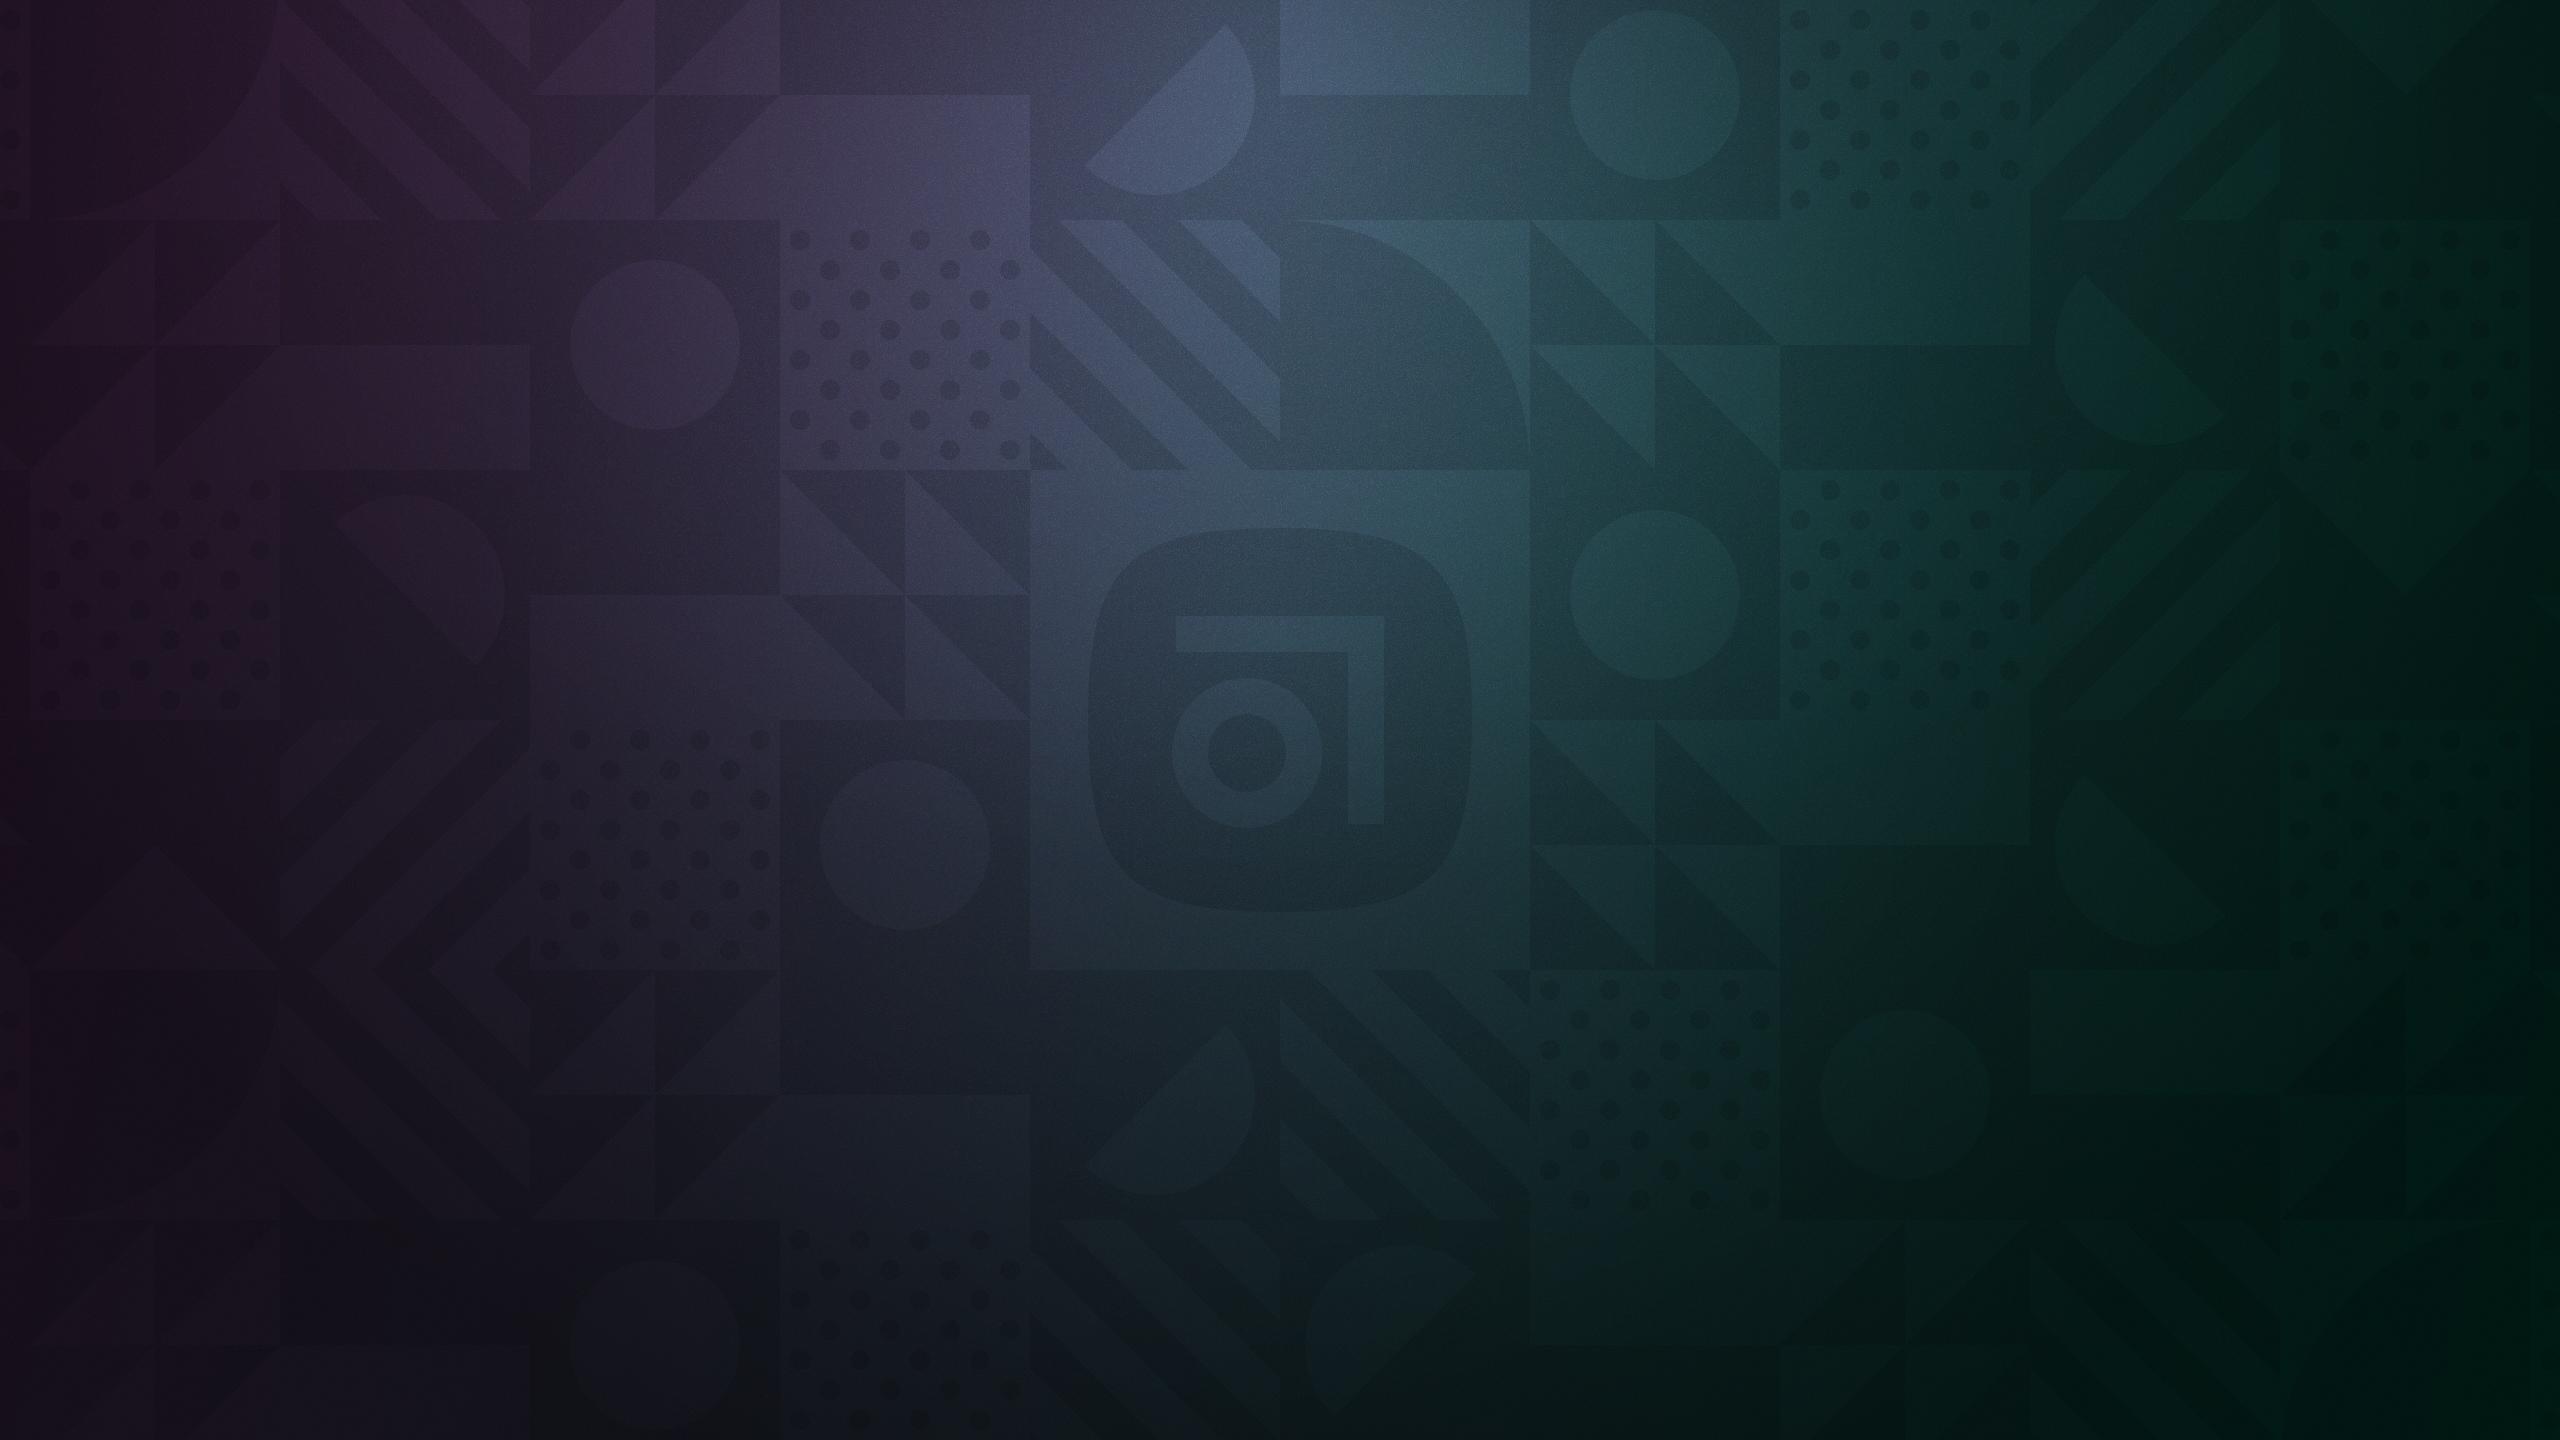 Wallpaper 2560x1440